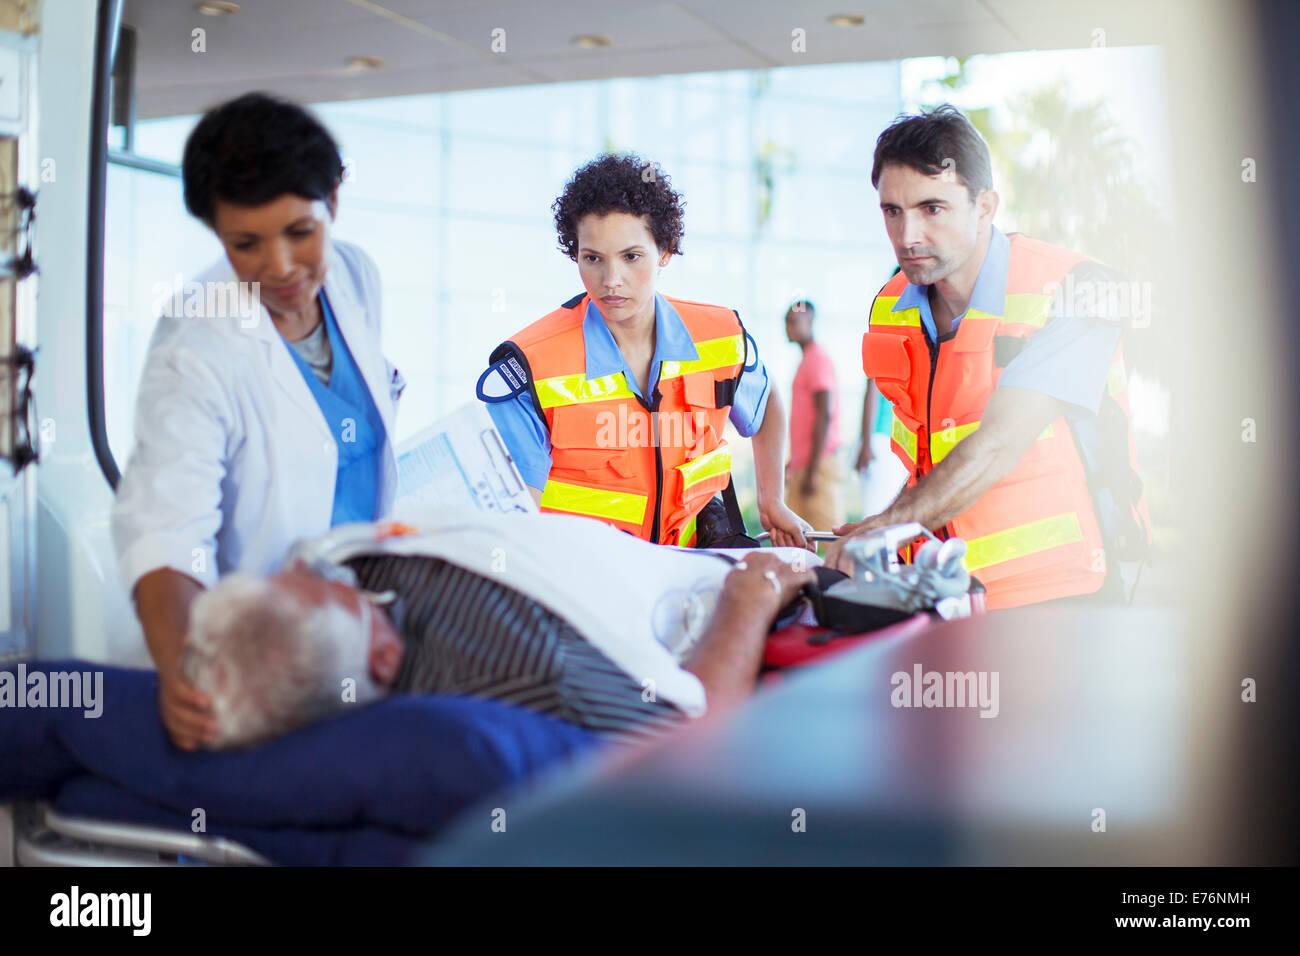 Paramedics and nurse examining patient in ambulance - Stock Image